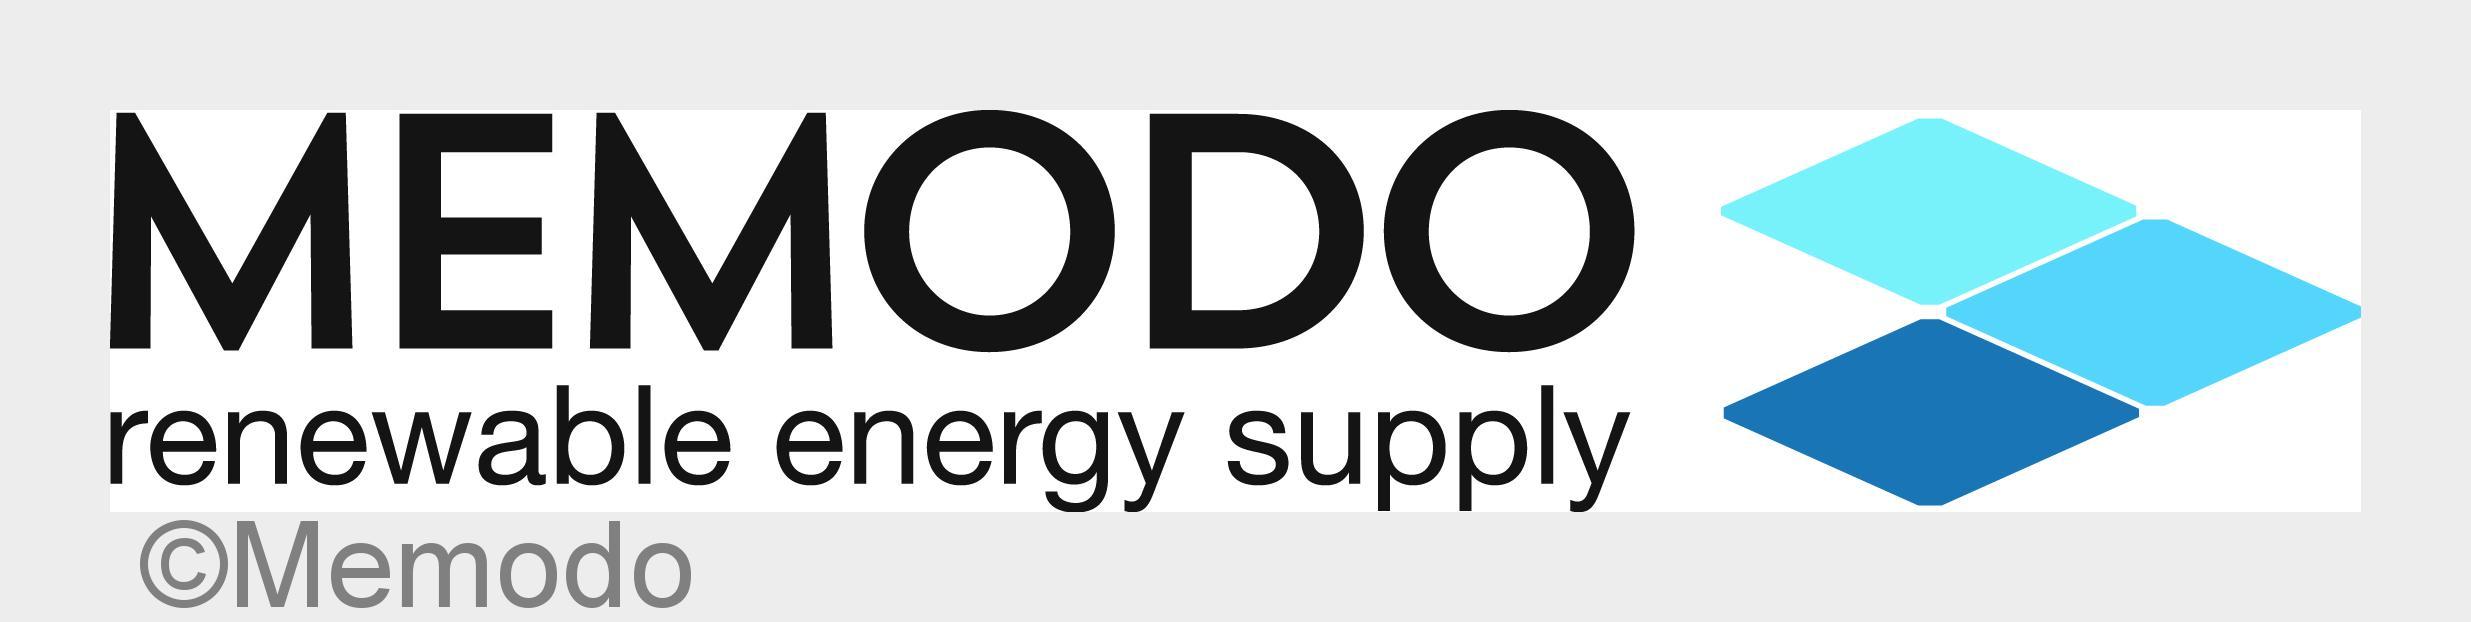 Energiespeicher-Experte und Gro#xDFh#xE4ndler  Memodo expandiert